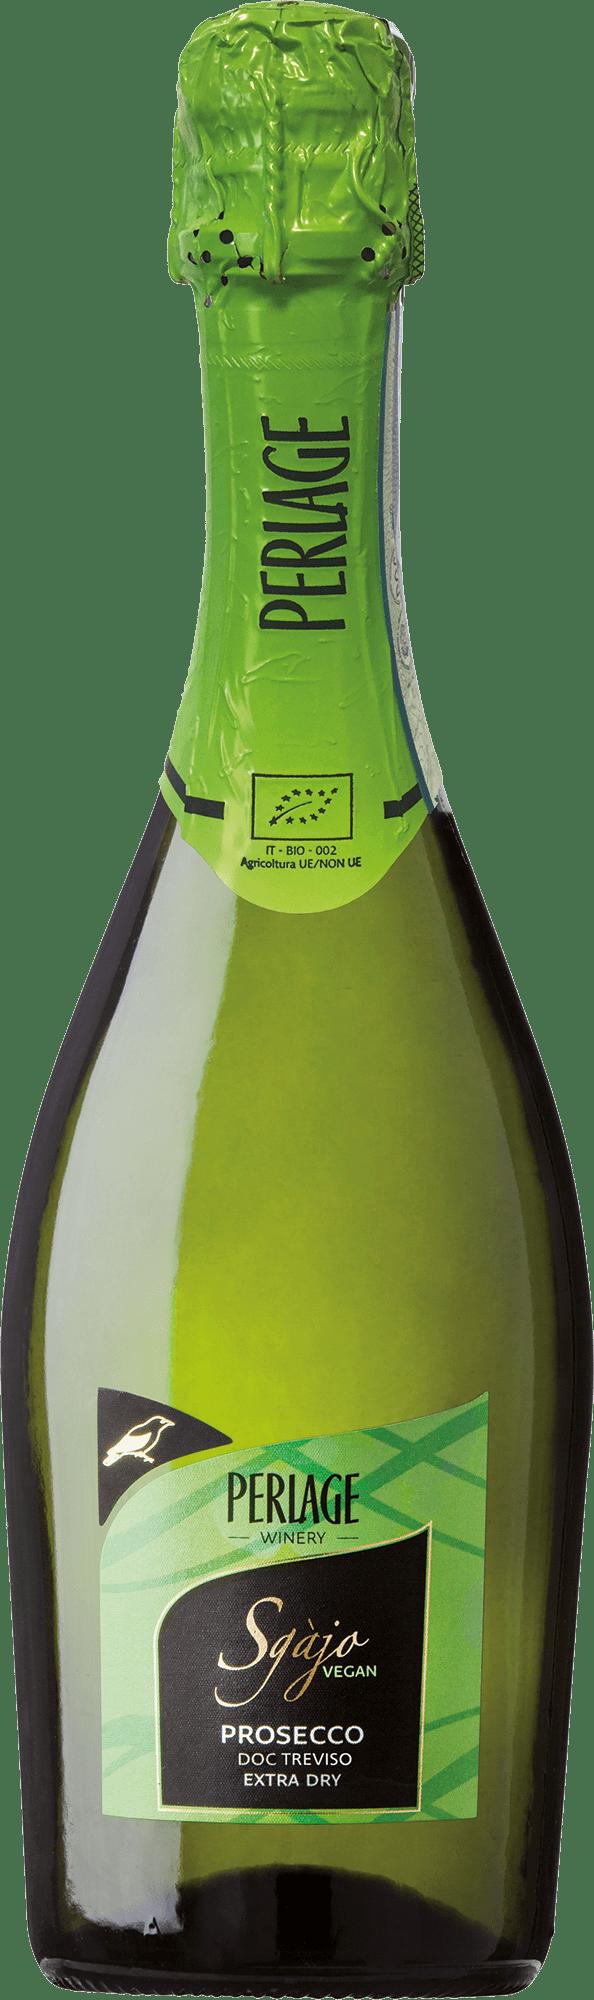 Sgàjo: Prosecco Treviso DOC Extra Dry biologico e vegano